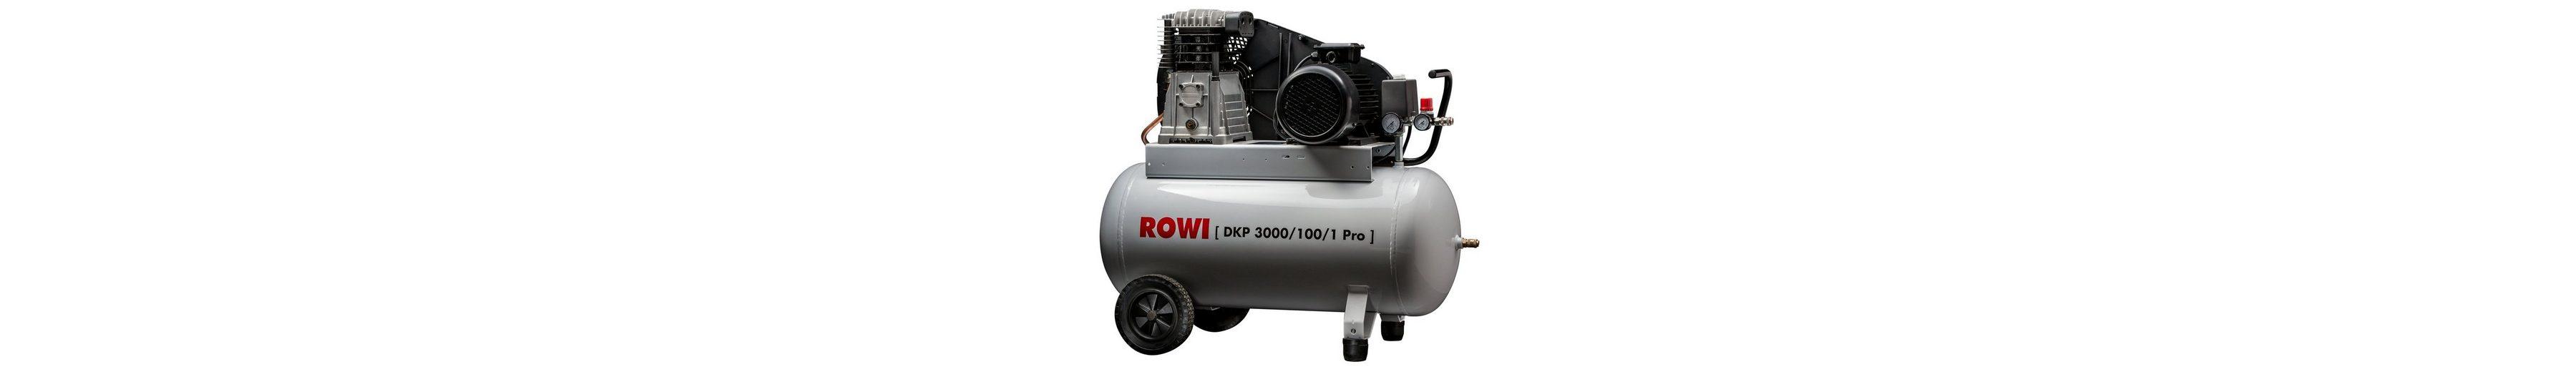 Kompressor »DKP 3000/100/1 Pro«